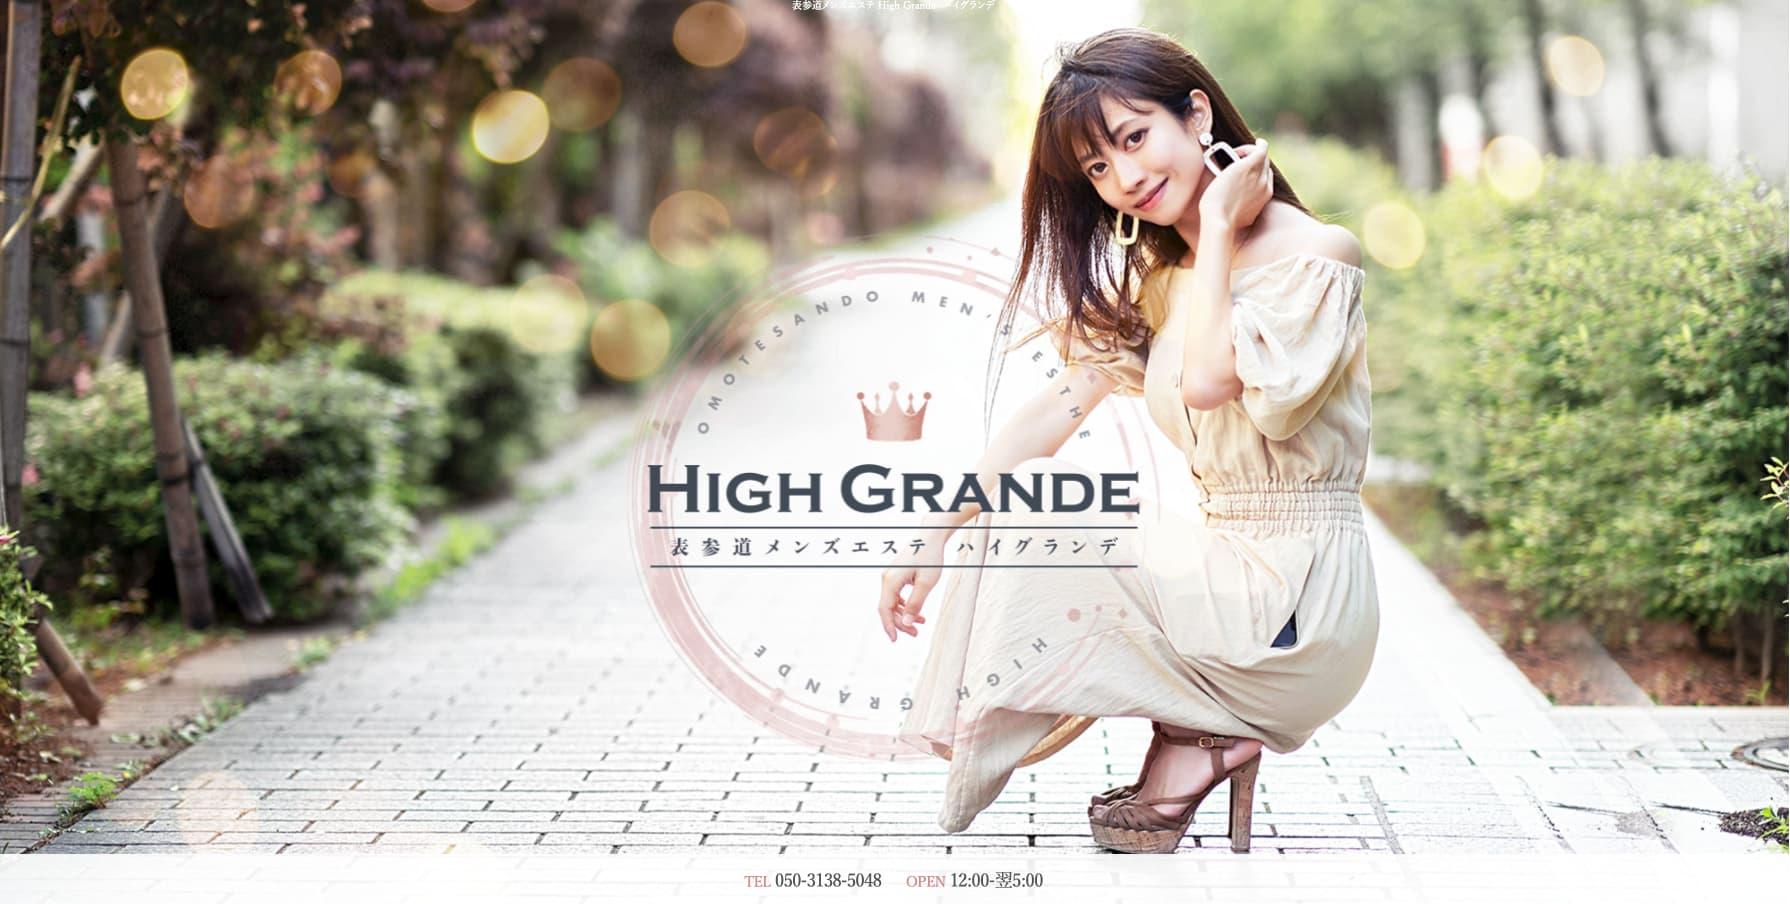 High Grande(ハイグランデ)